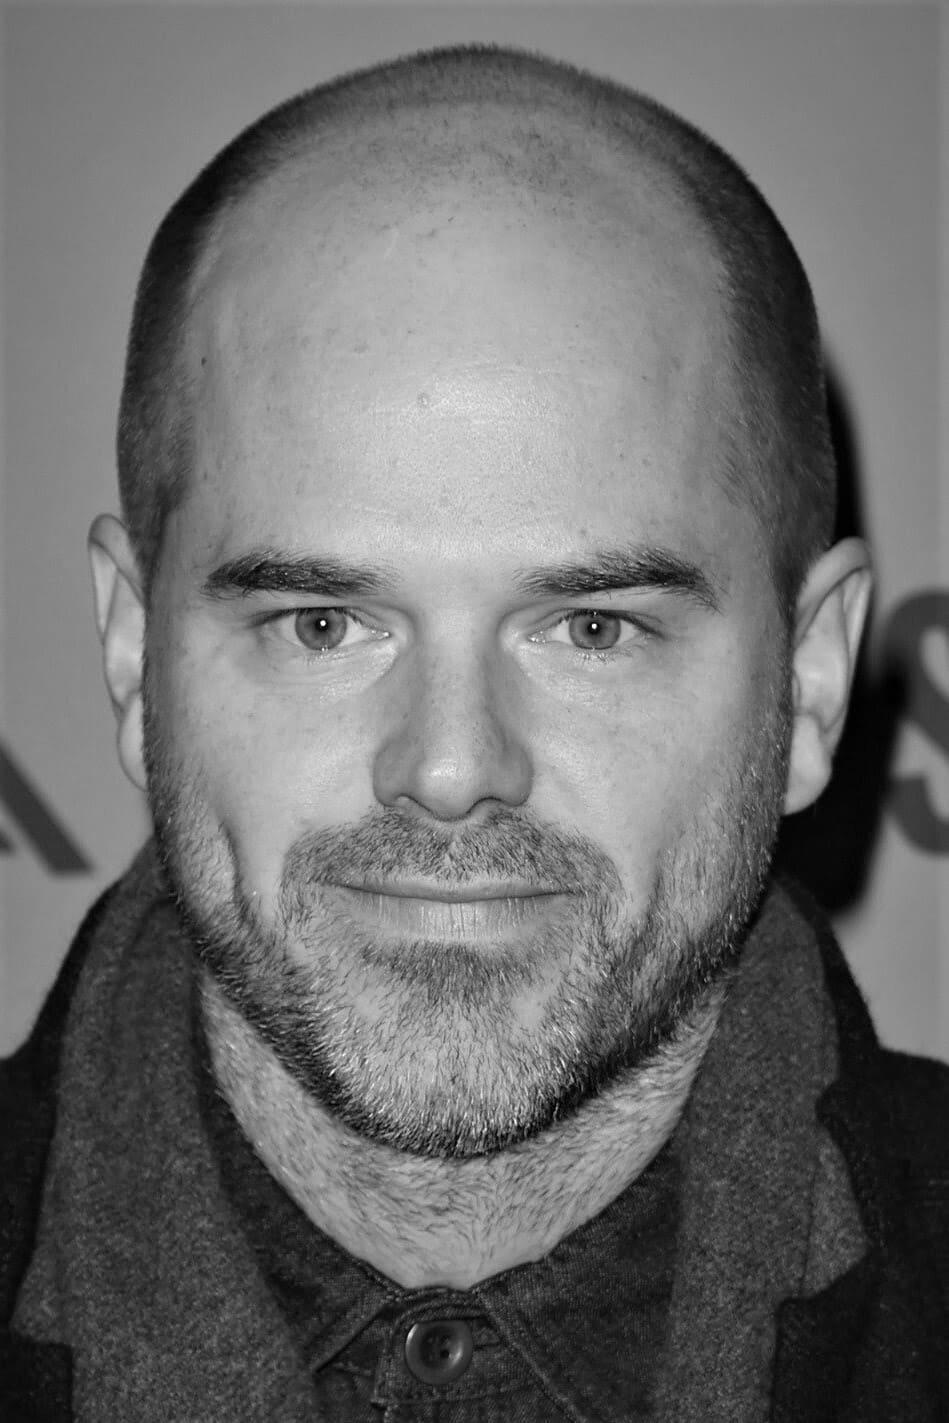 Sean Durkin